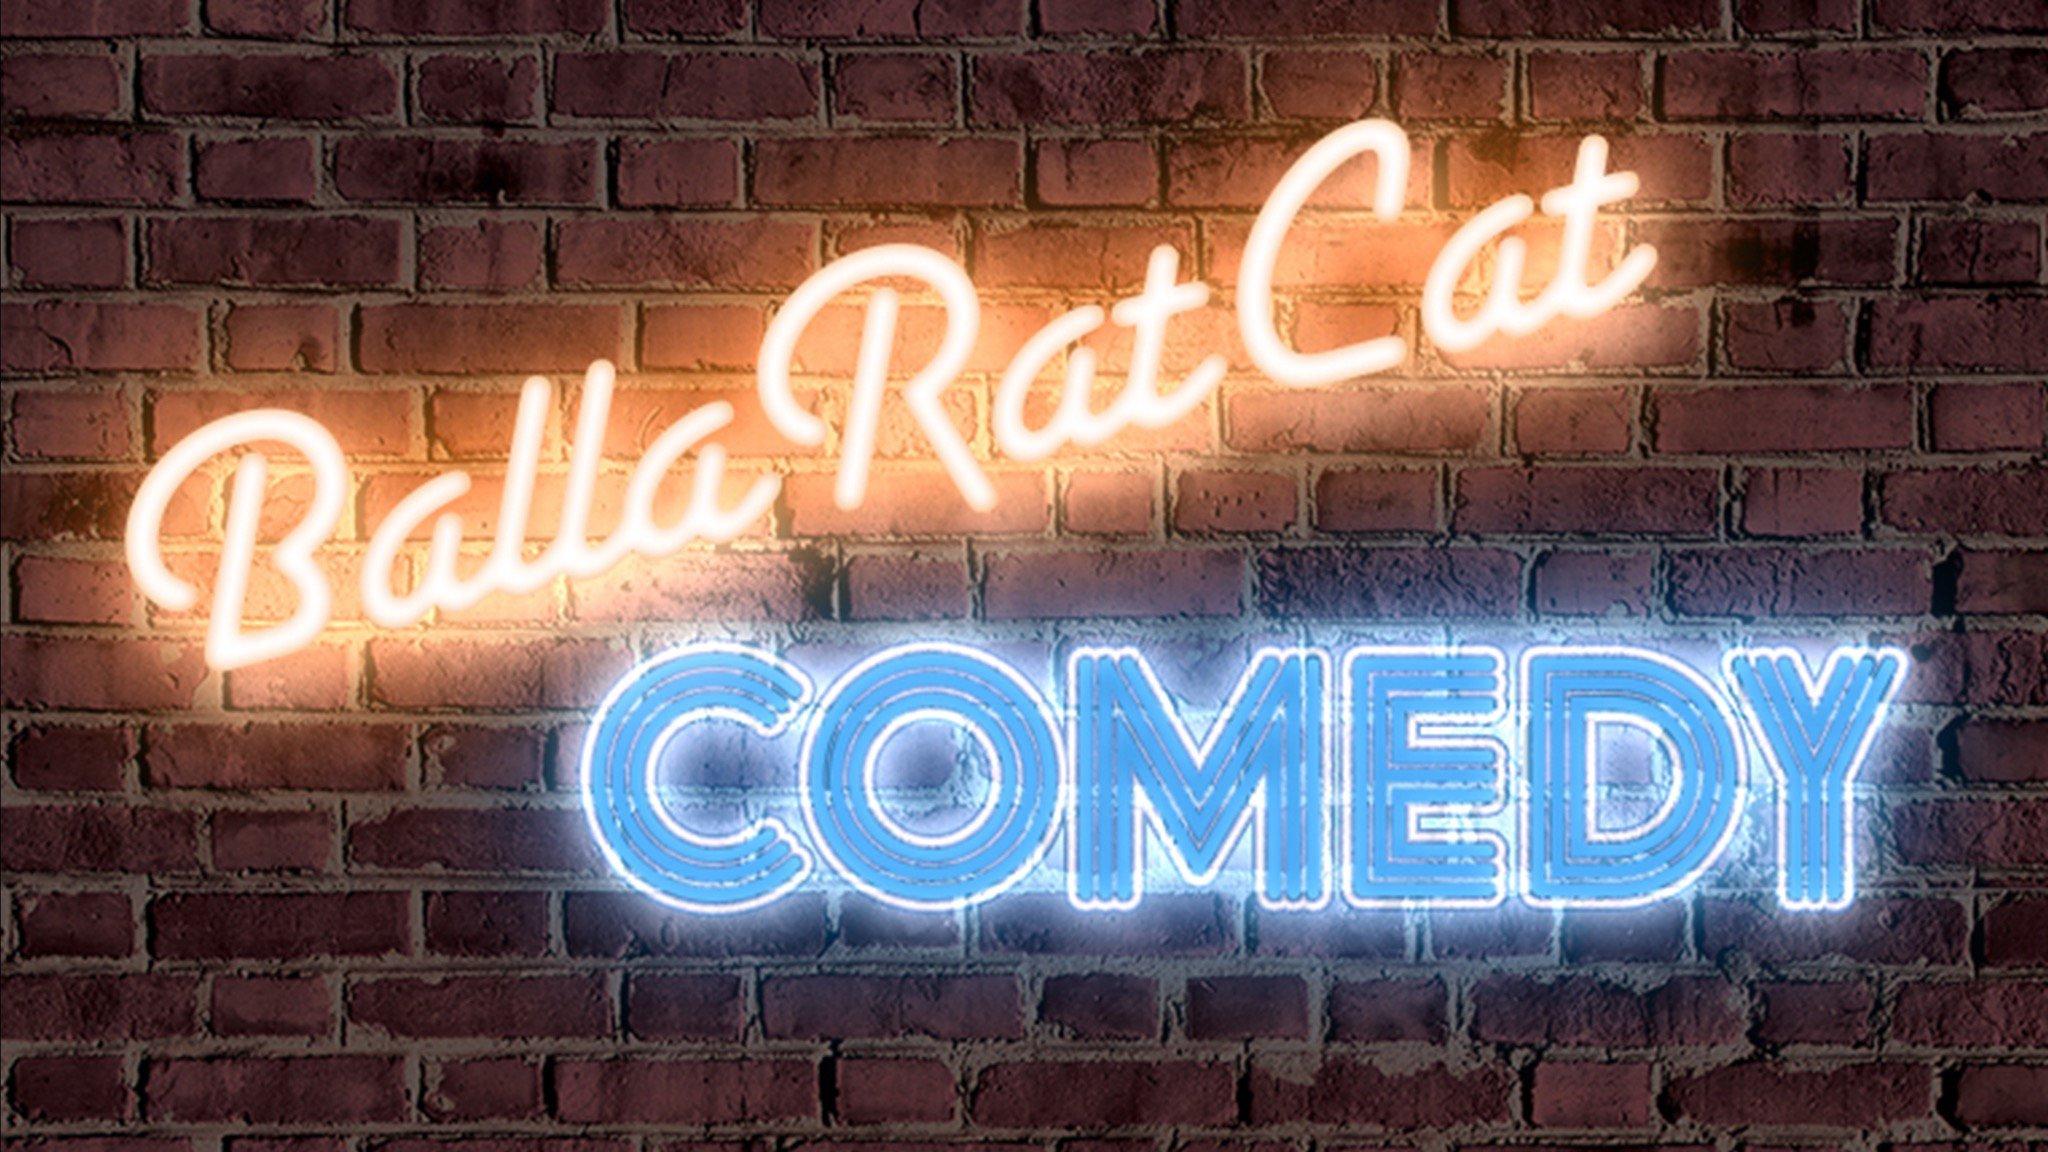 BallaRatCat Comedy